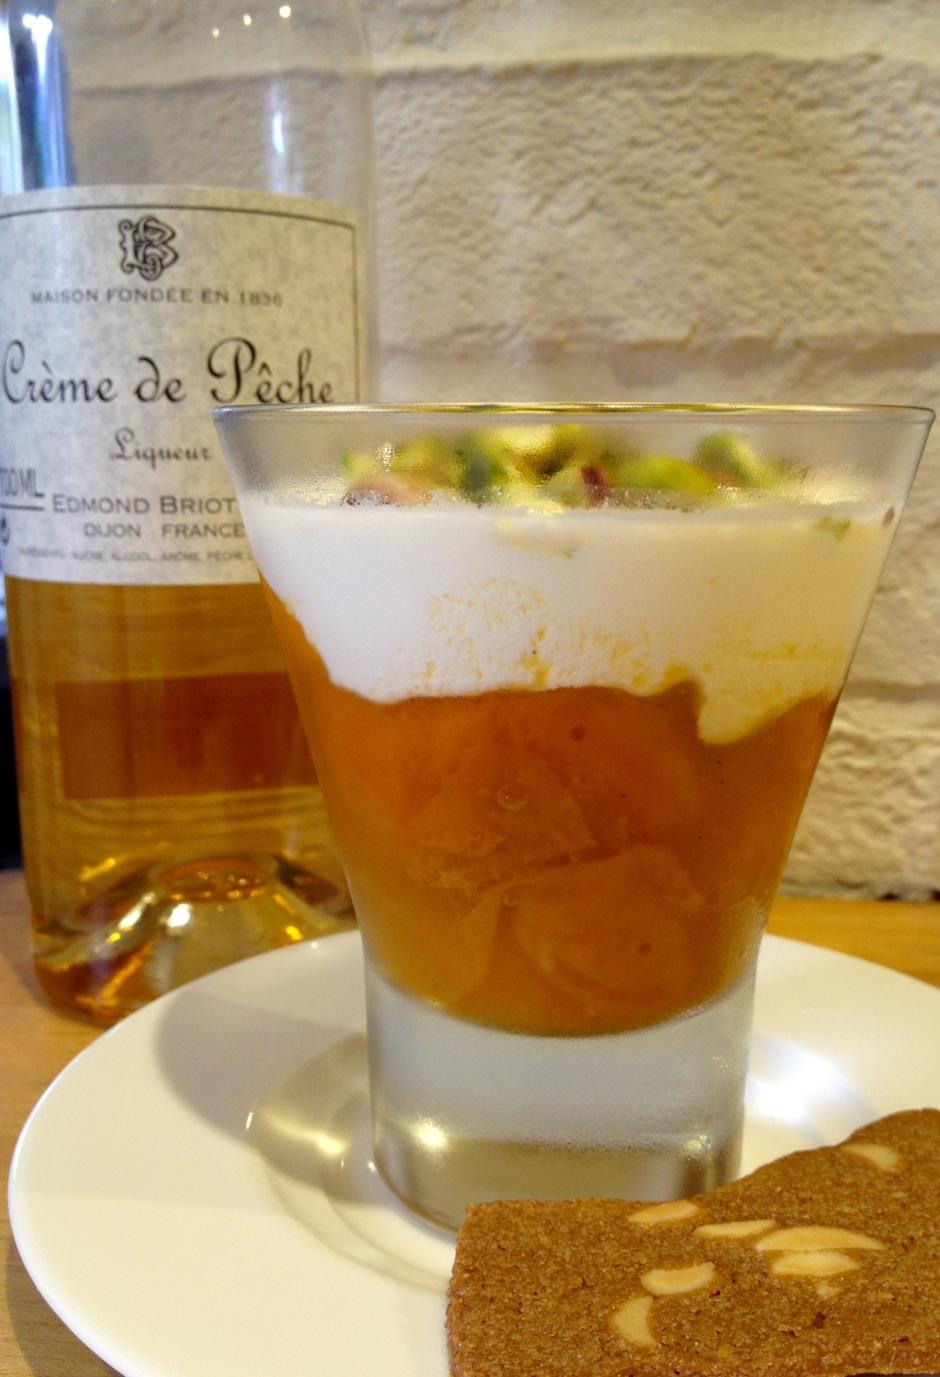 Apricot yoghurt sundae